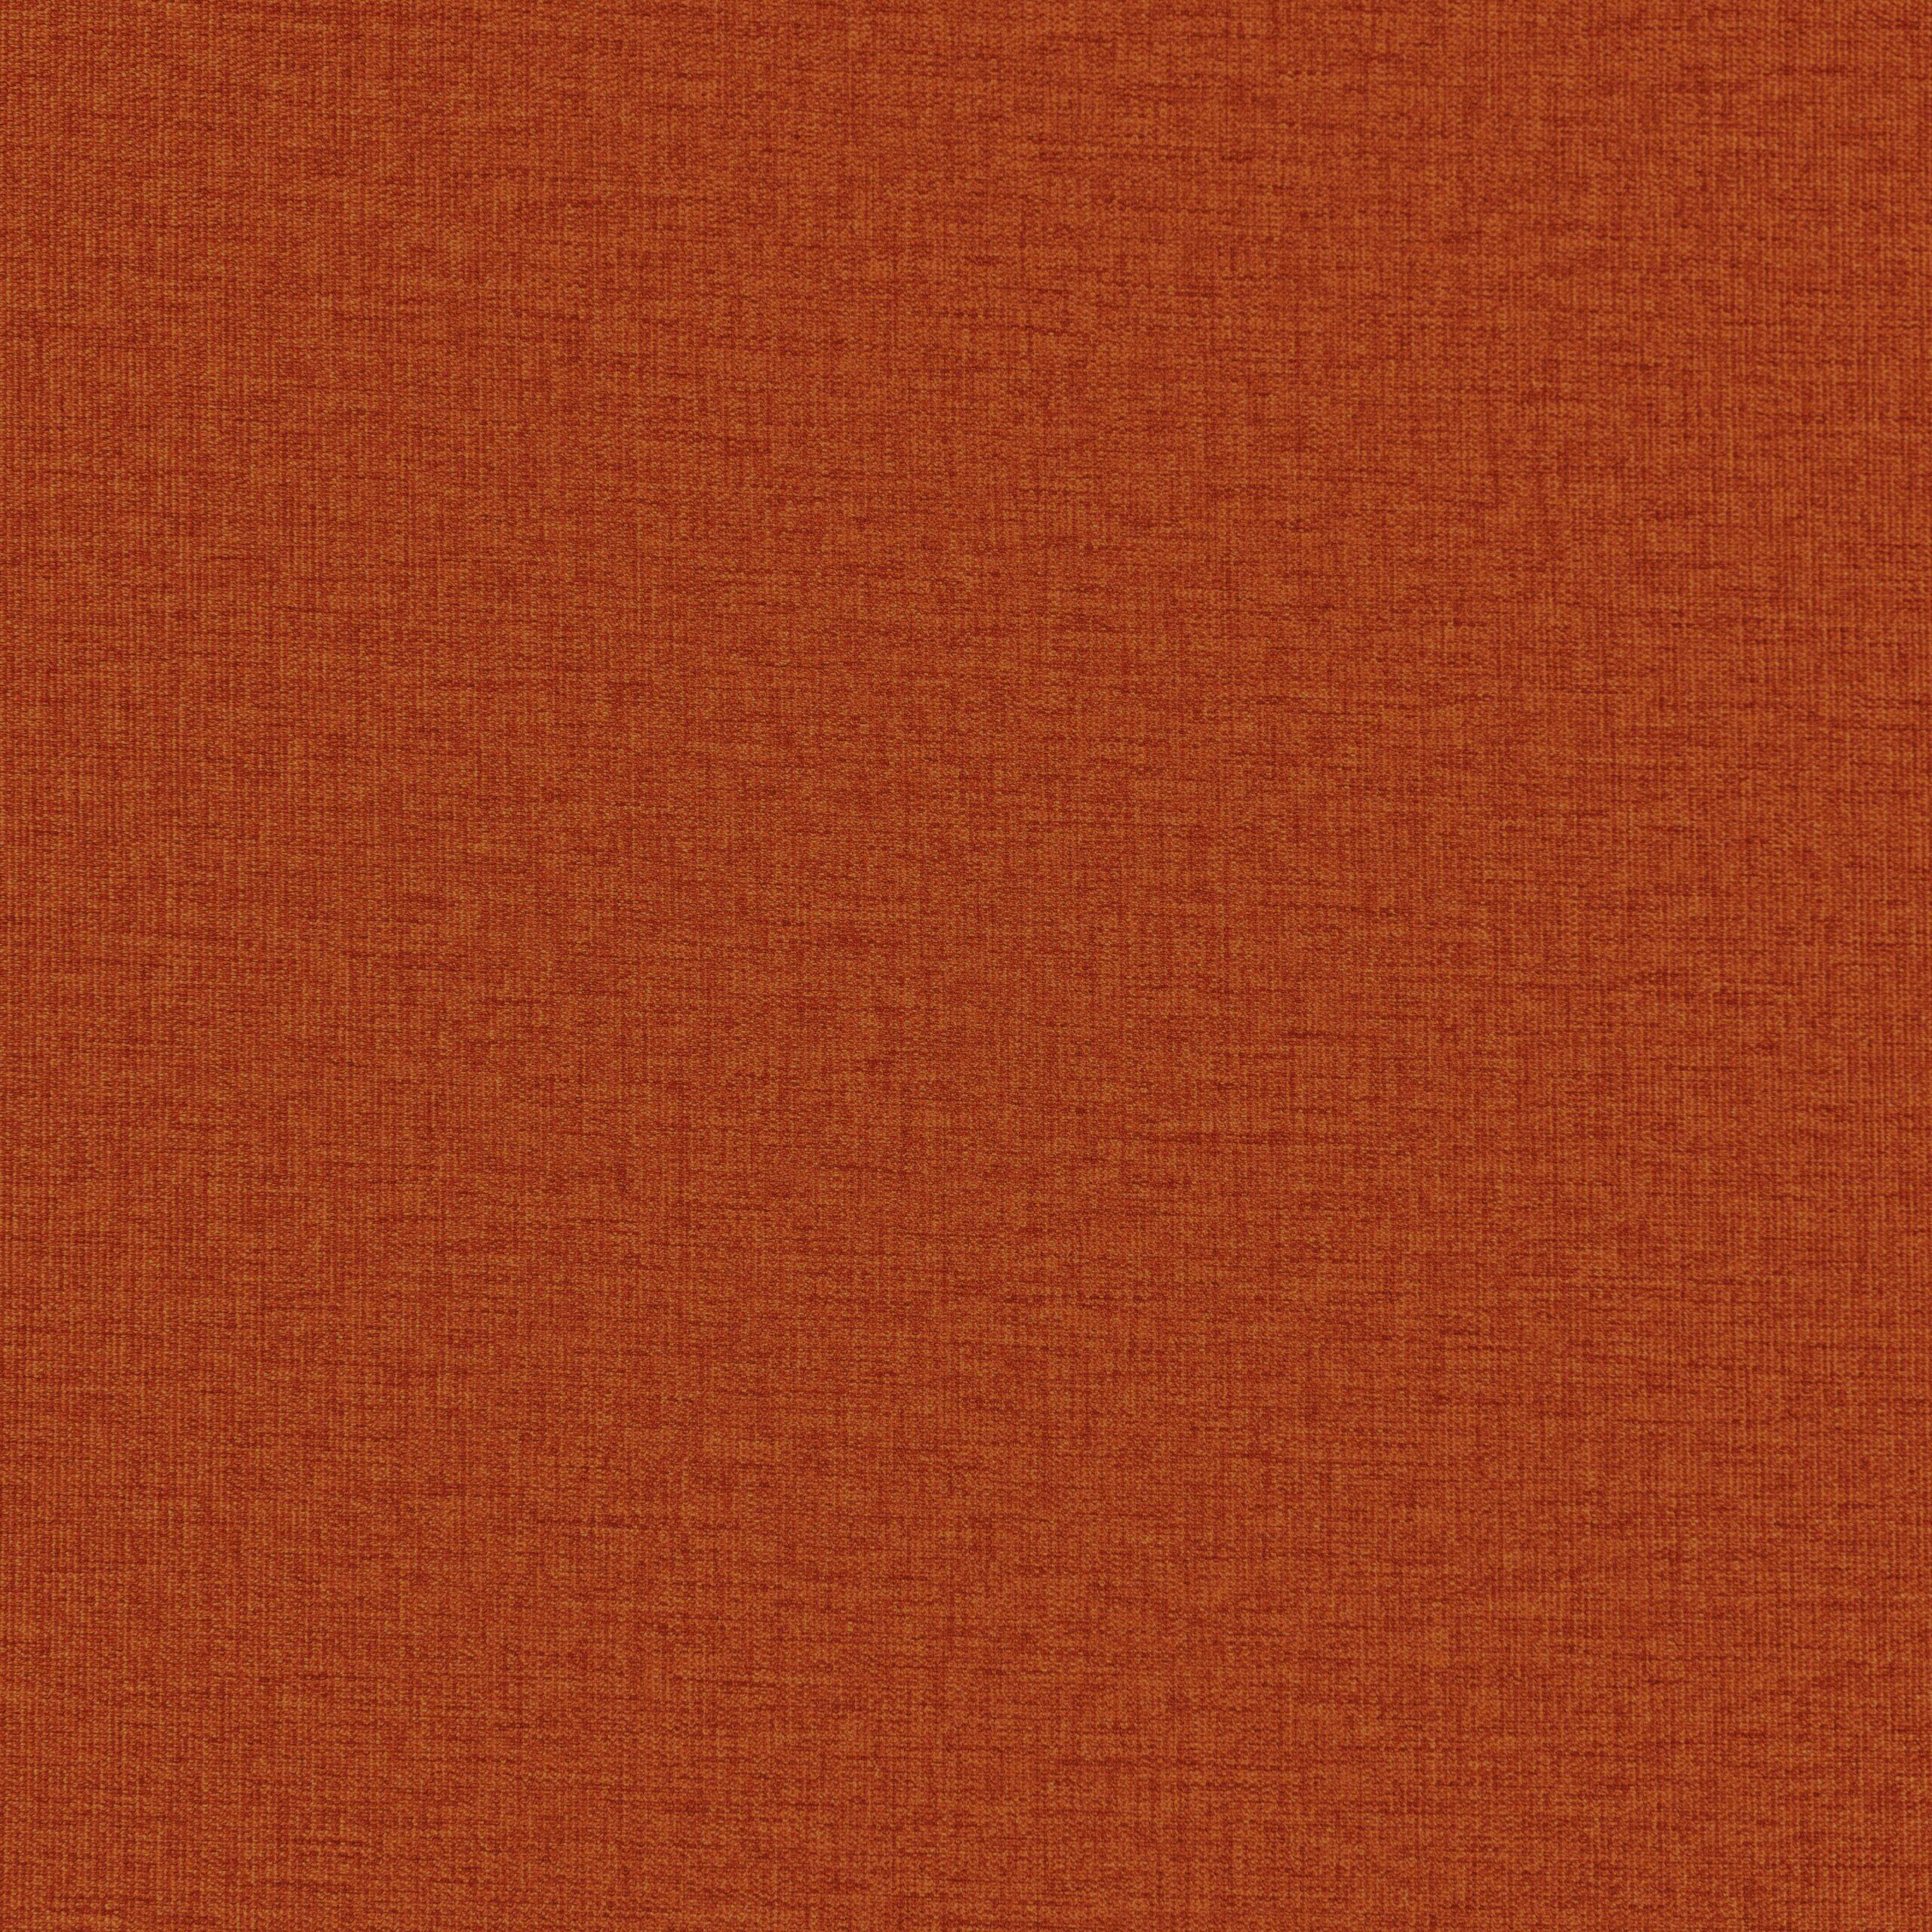 Lido Trend 152 Burnt Orange